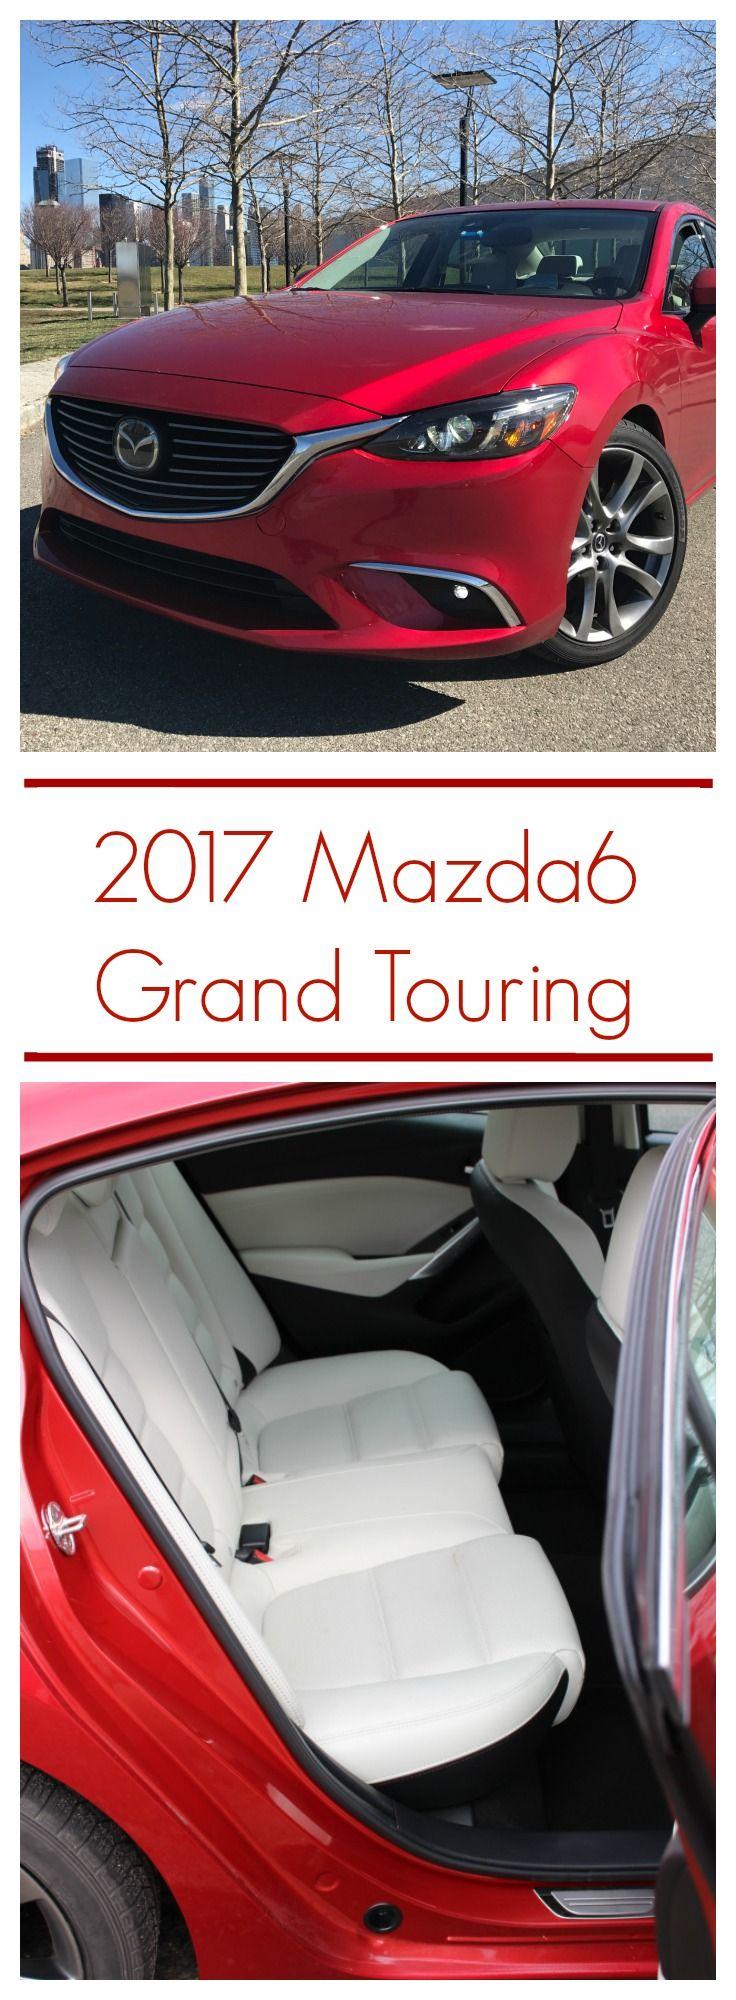 The 2017 Mazda6 Grand Touring Mazda 6, Touring, Sedan